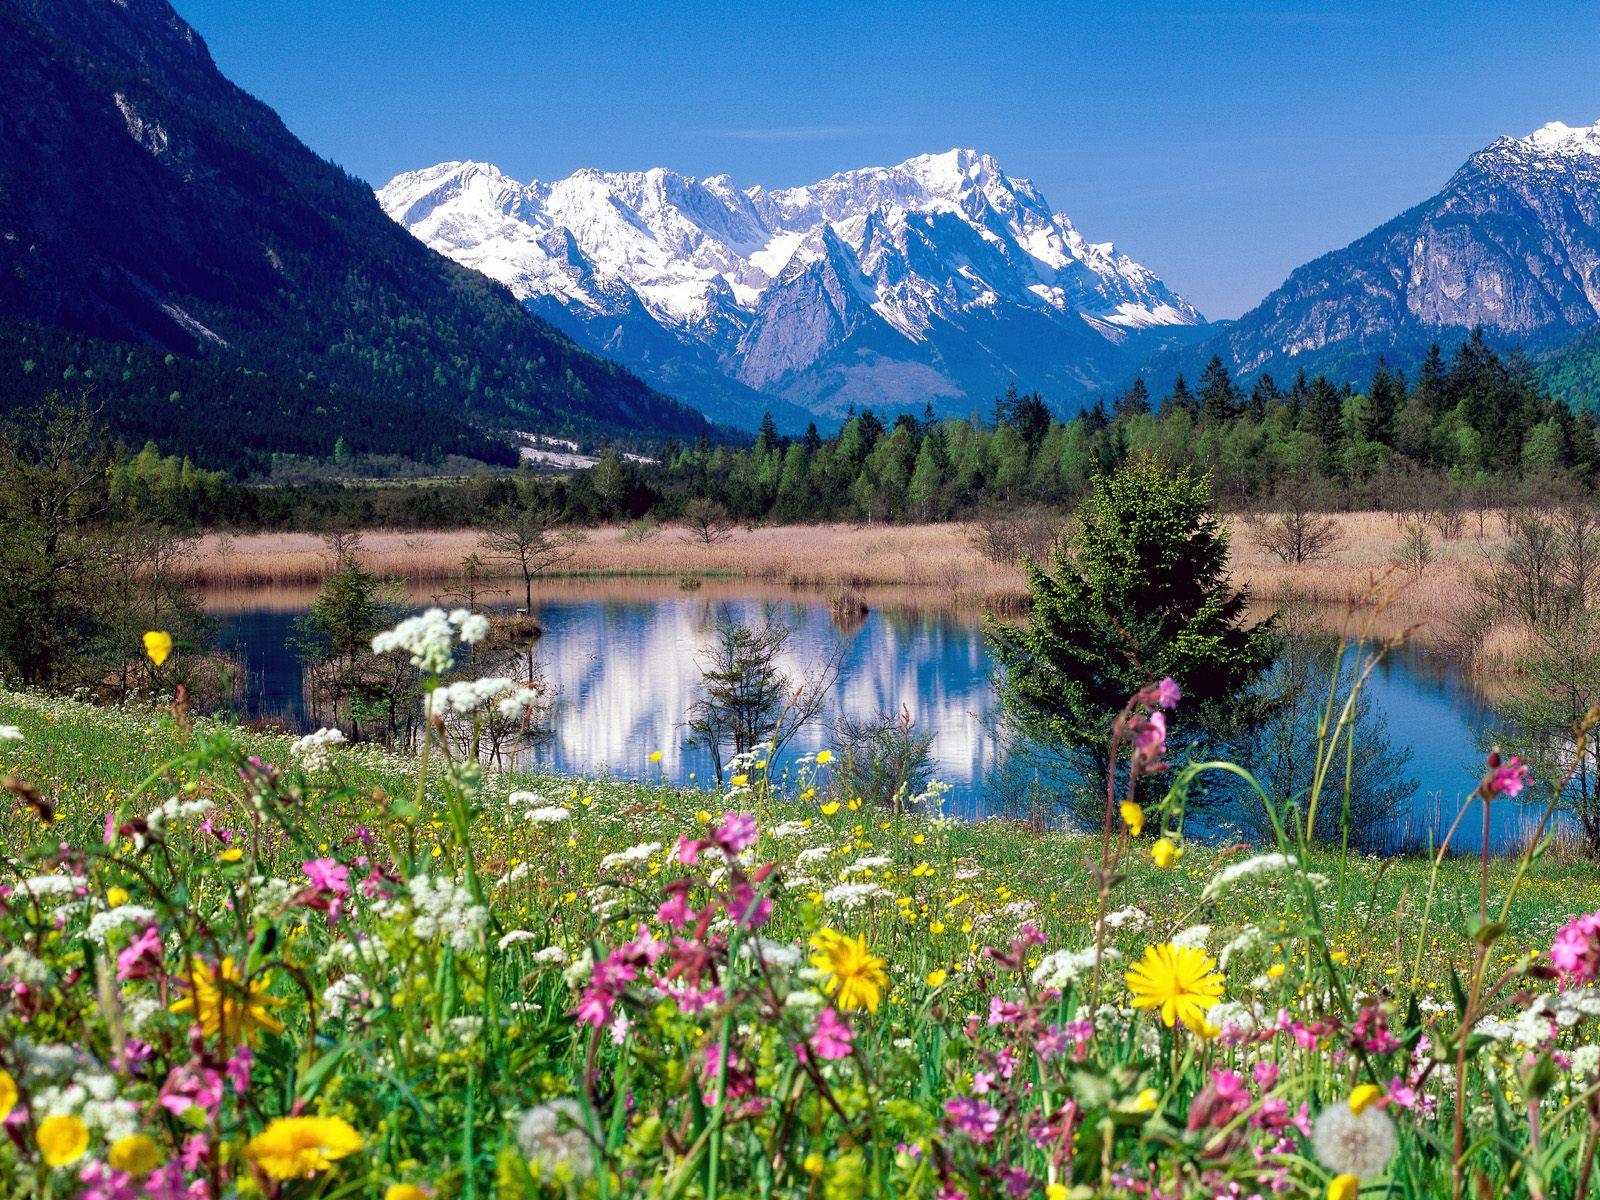 Nature Scene hd wallpaper desktop Background HD Wallpaper for 1600x1200